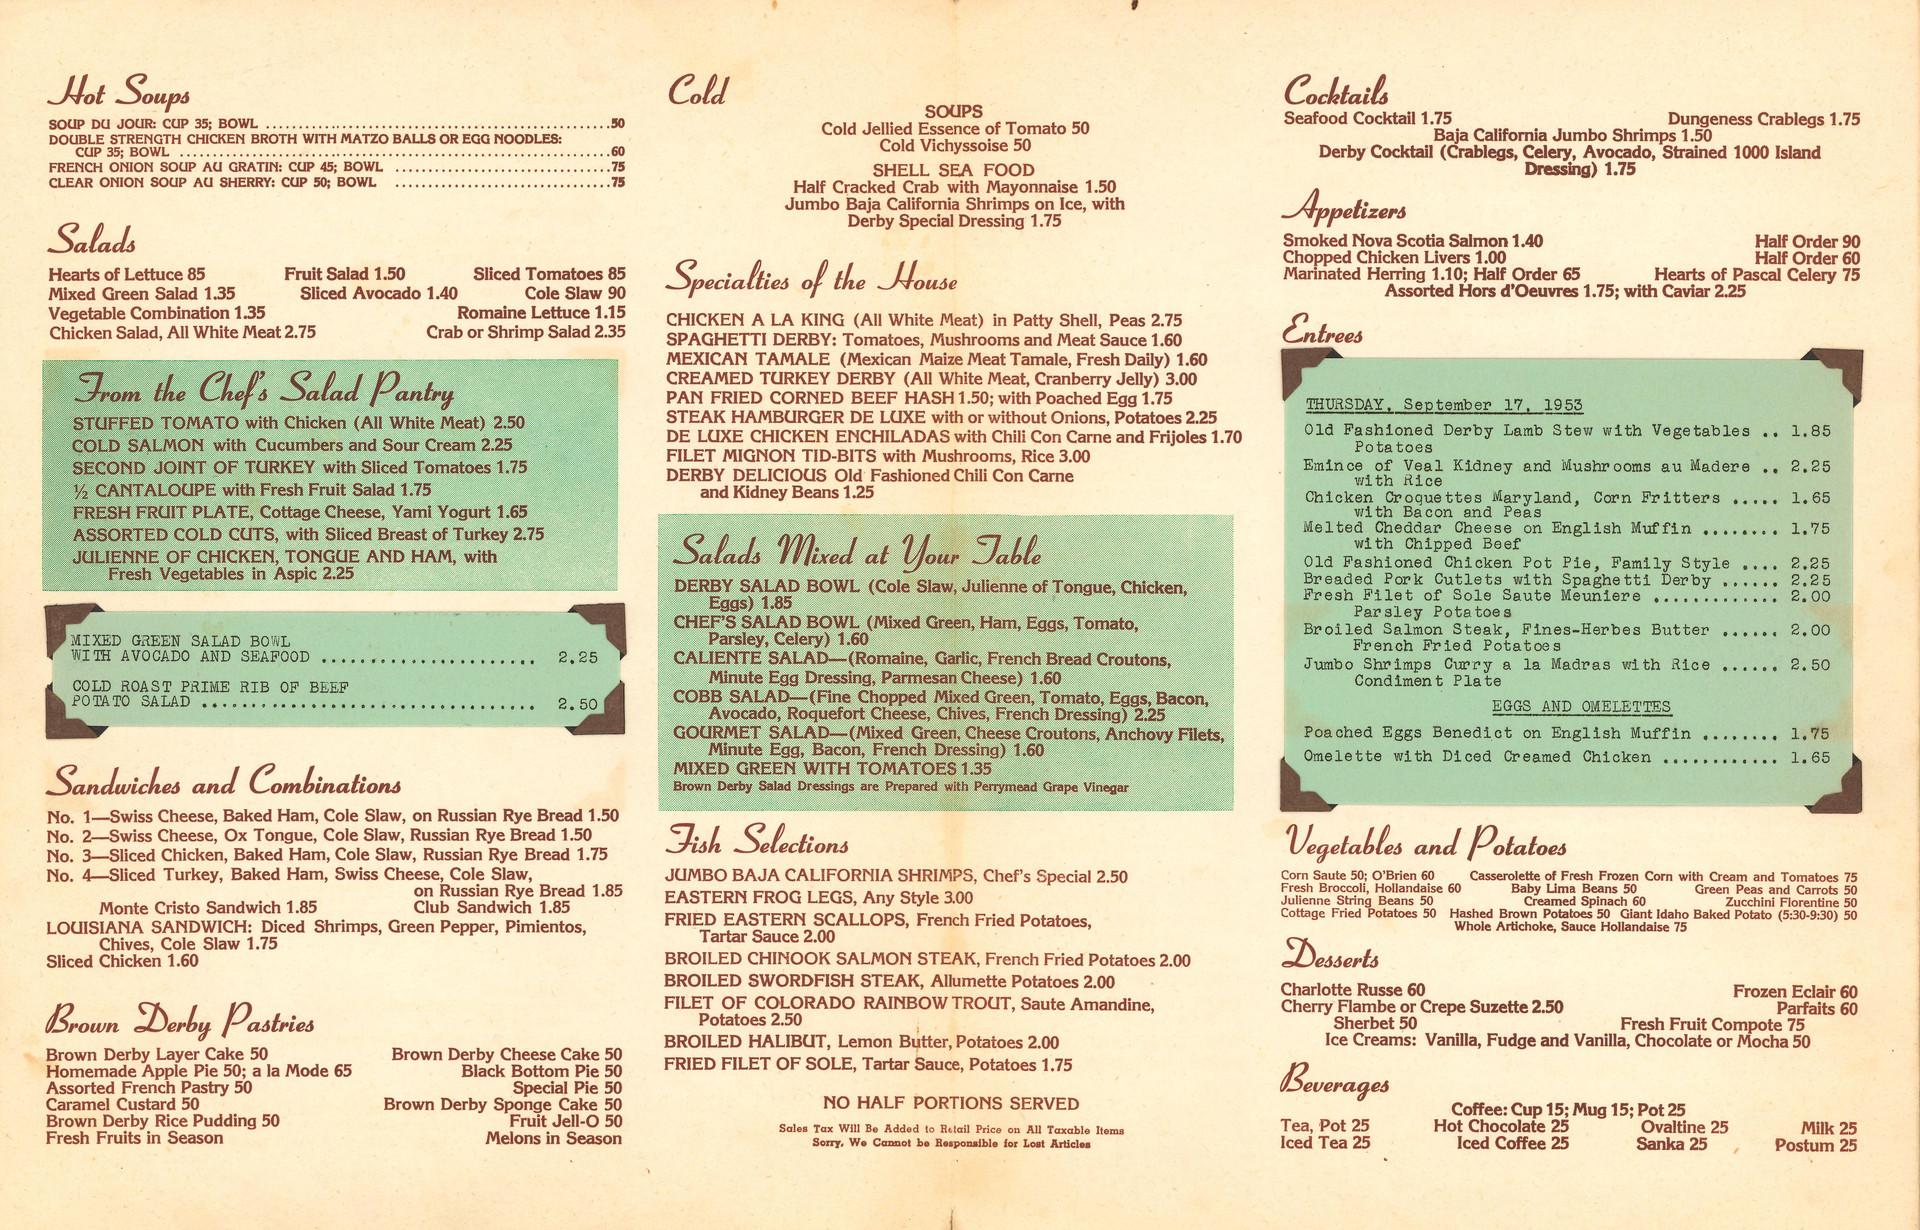 A Brown Derby menu from September 1953.